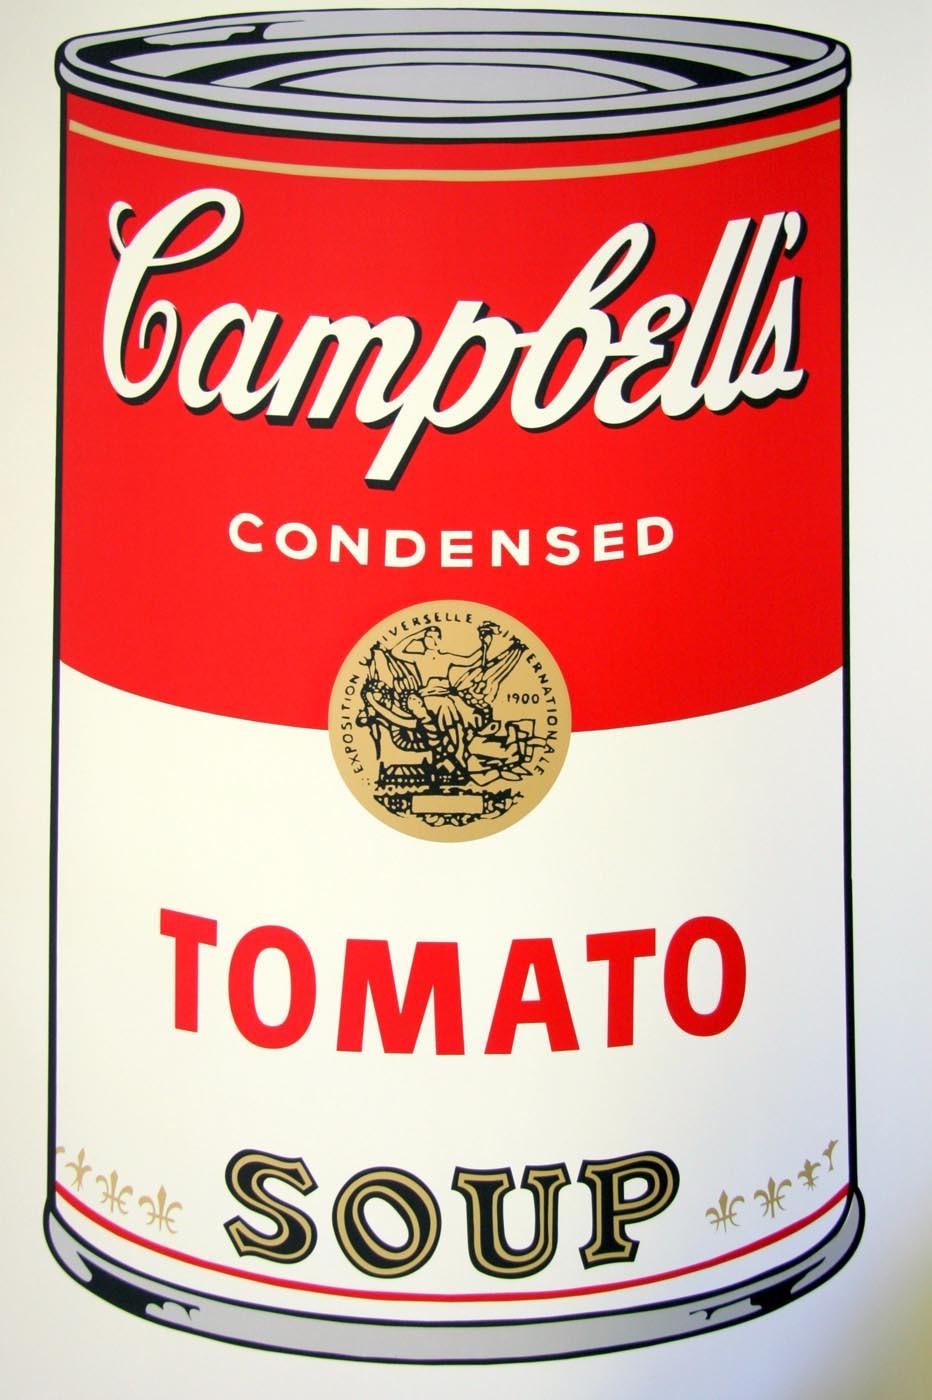 Campbell Tomato Soup  Humour Campbells Soup Tomato 46 Medium